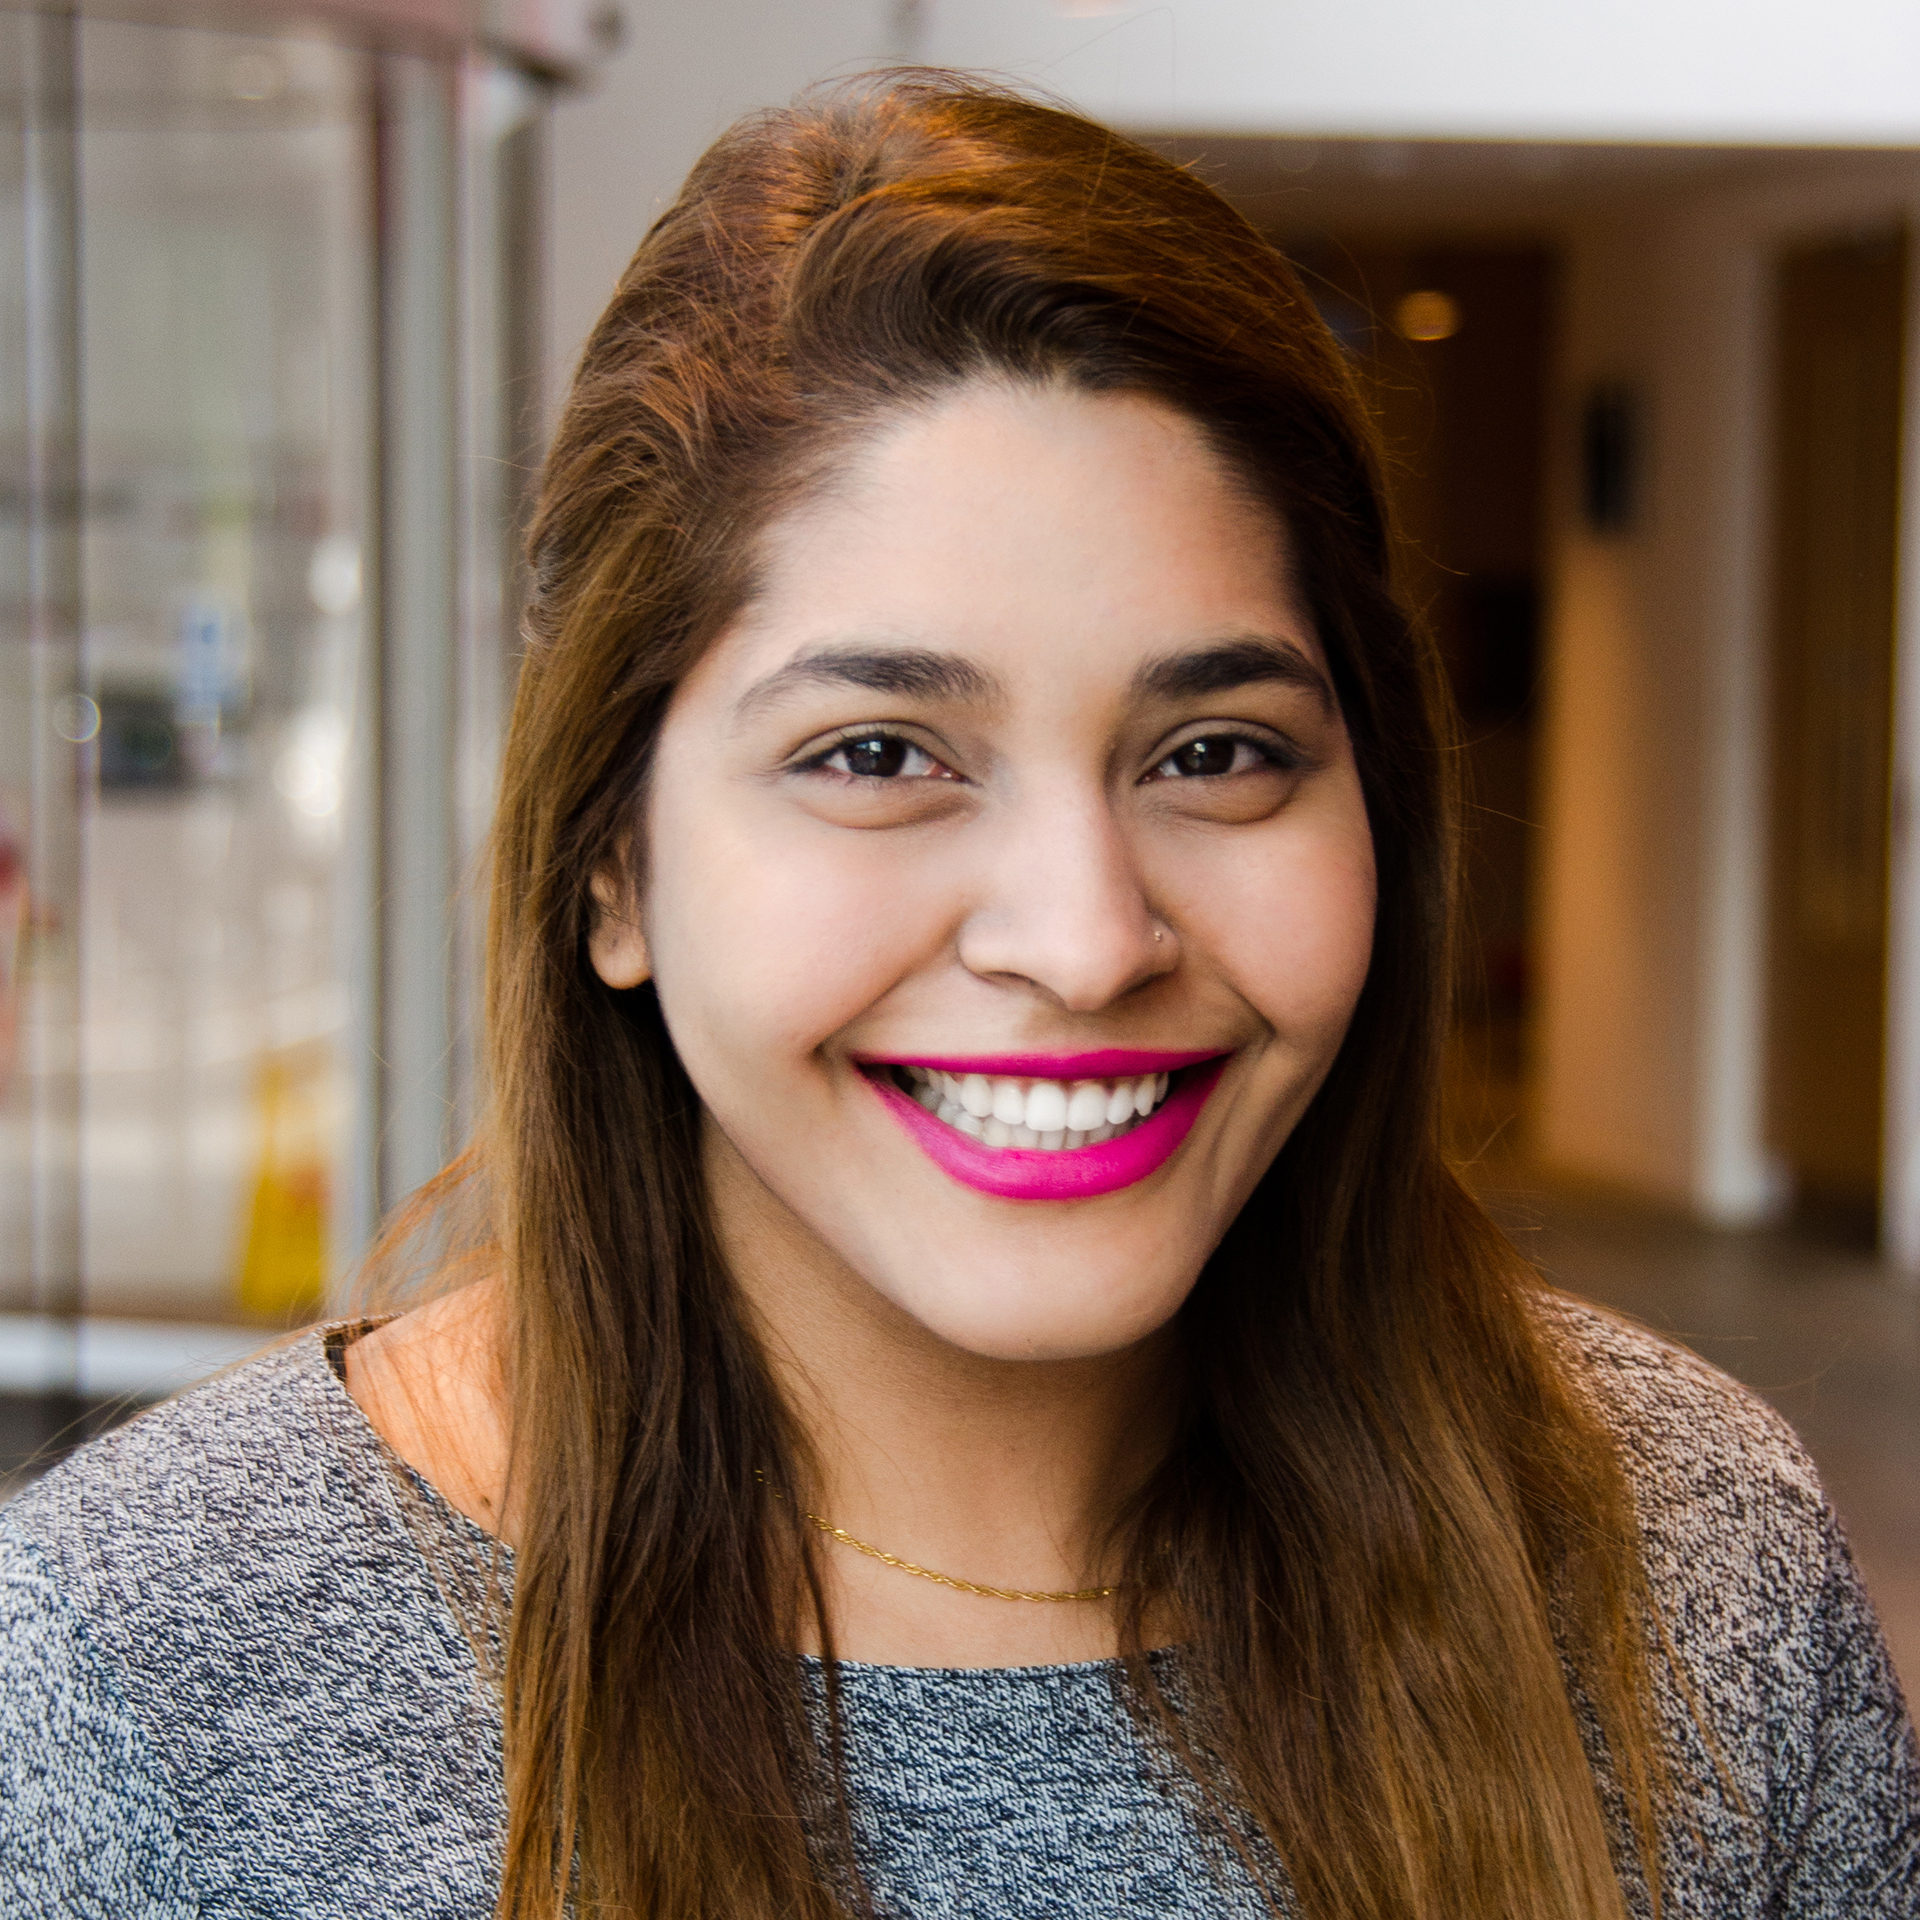 Photo of international student Radia at INTO London